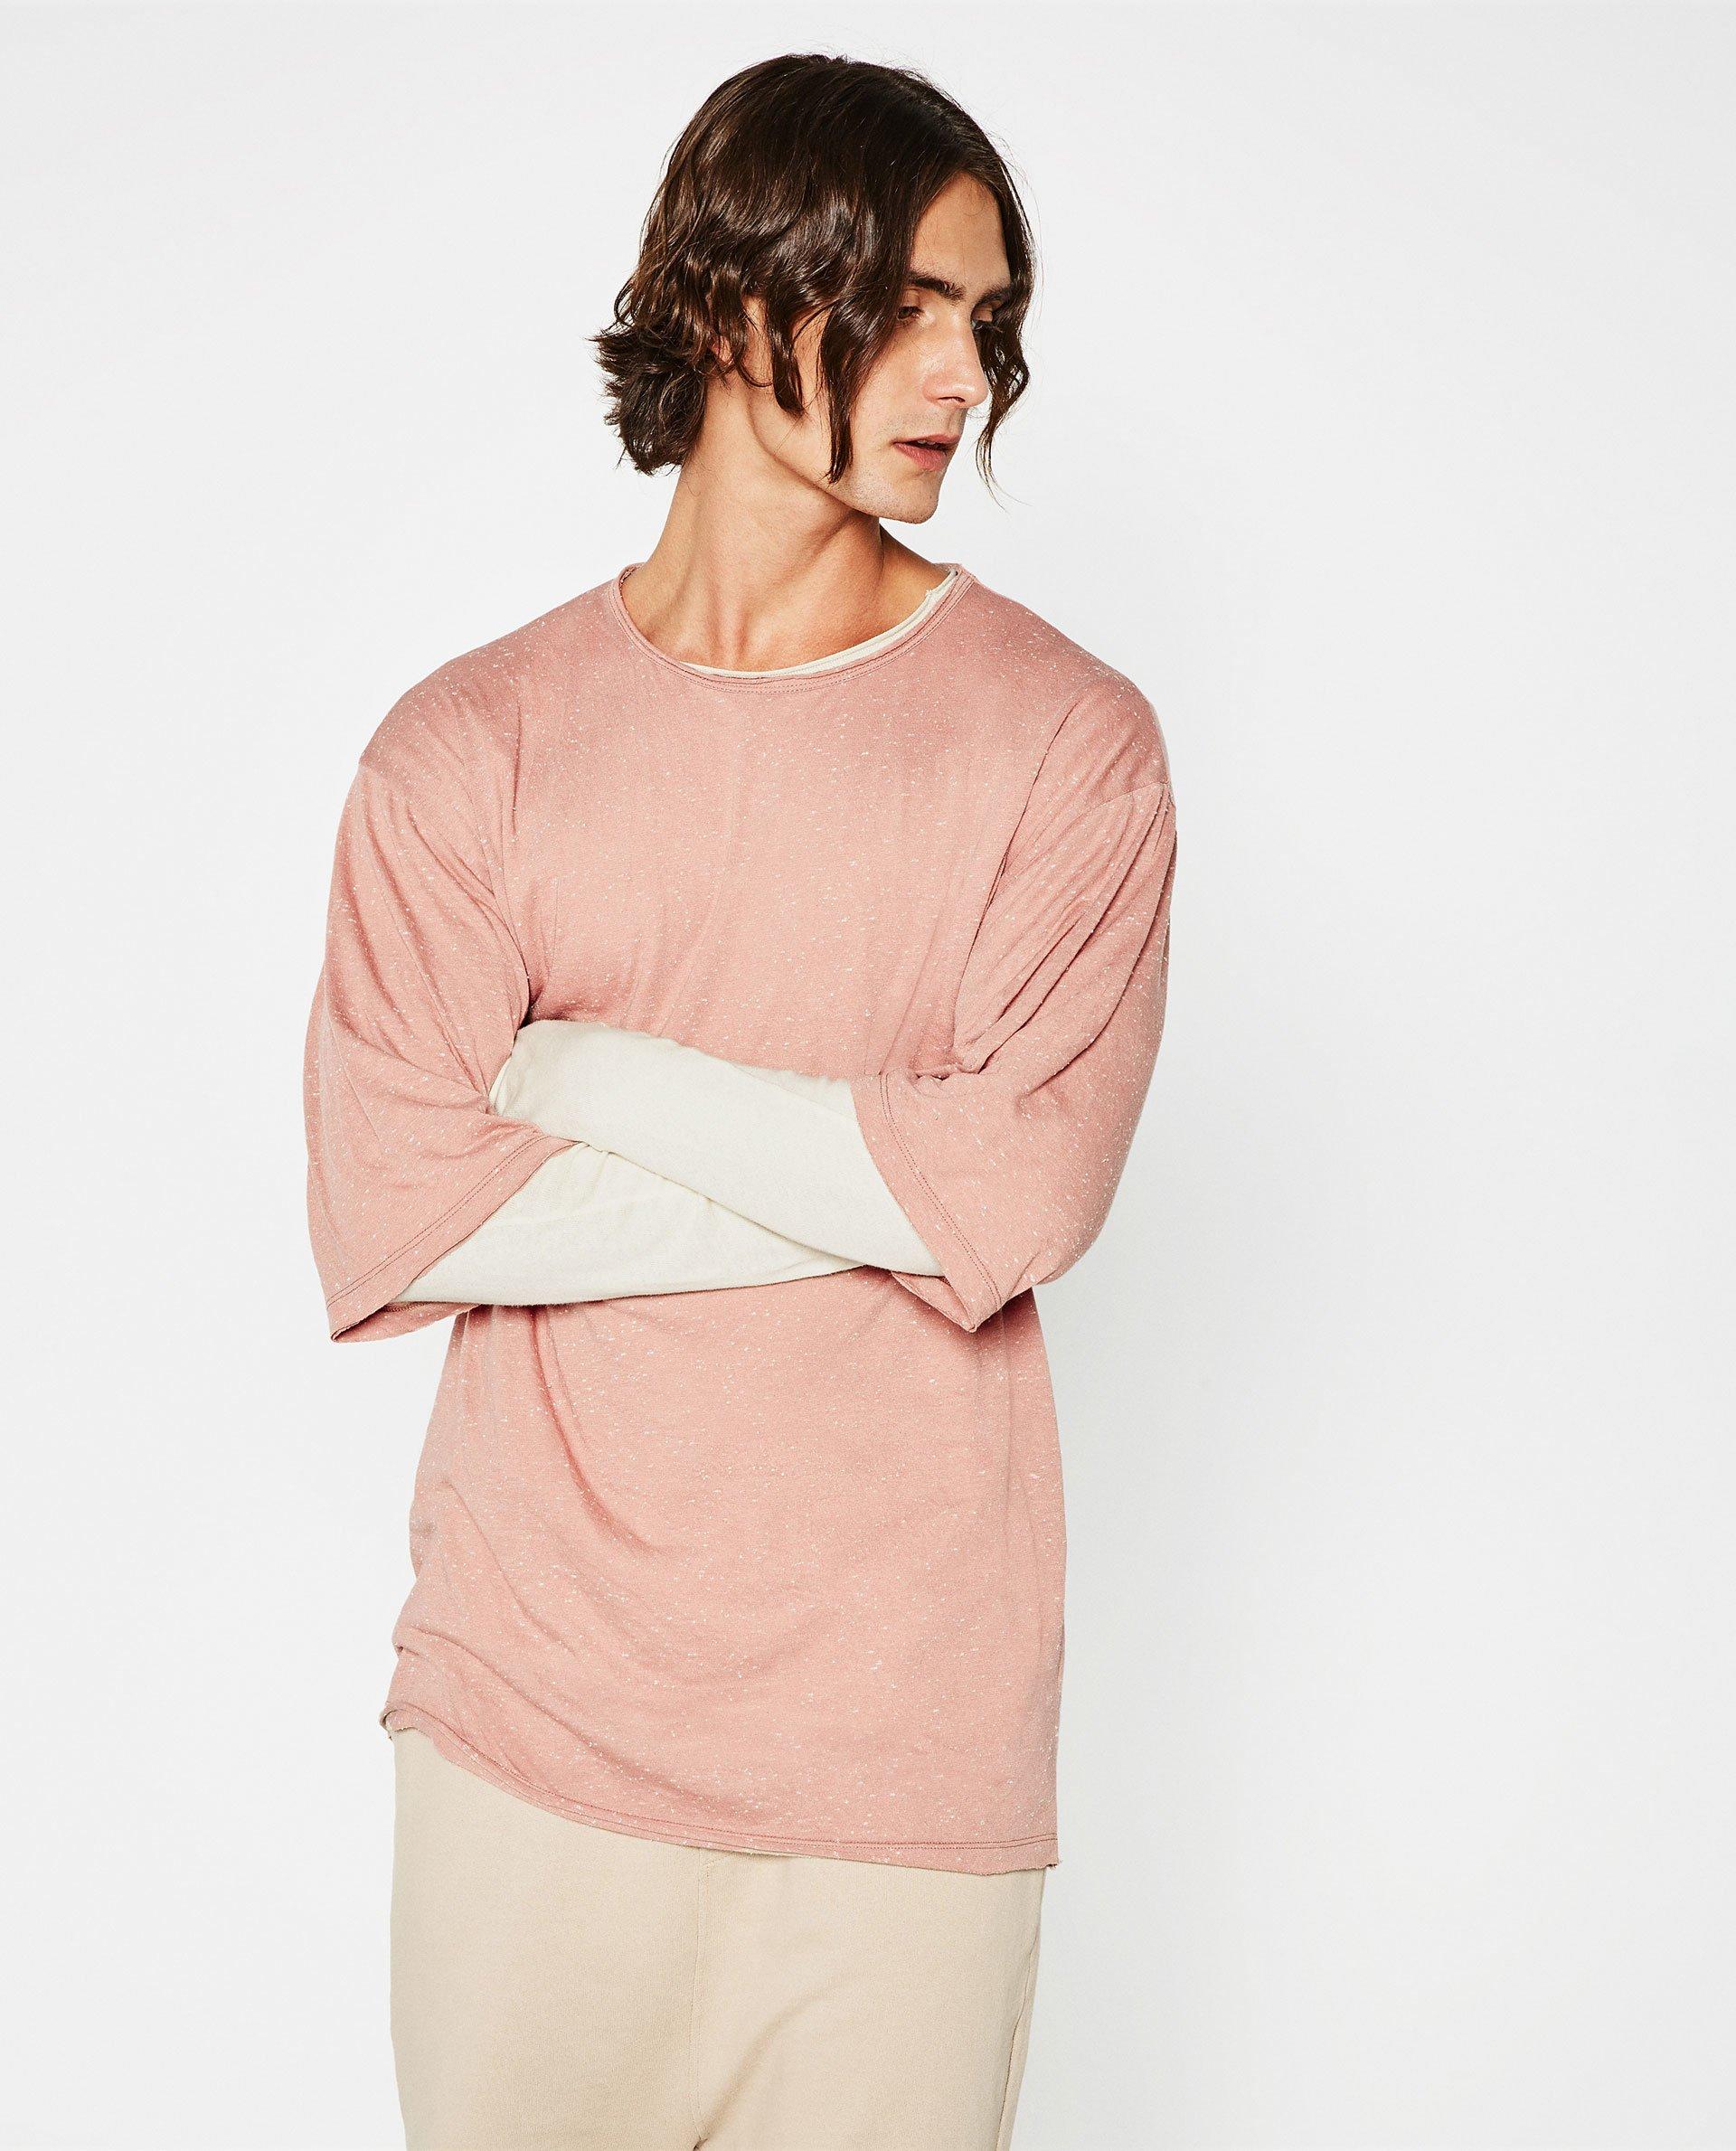 Zara Oversized T Shirt In Pink For Men Lyst